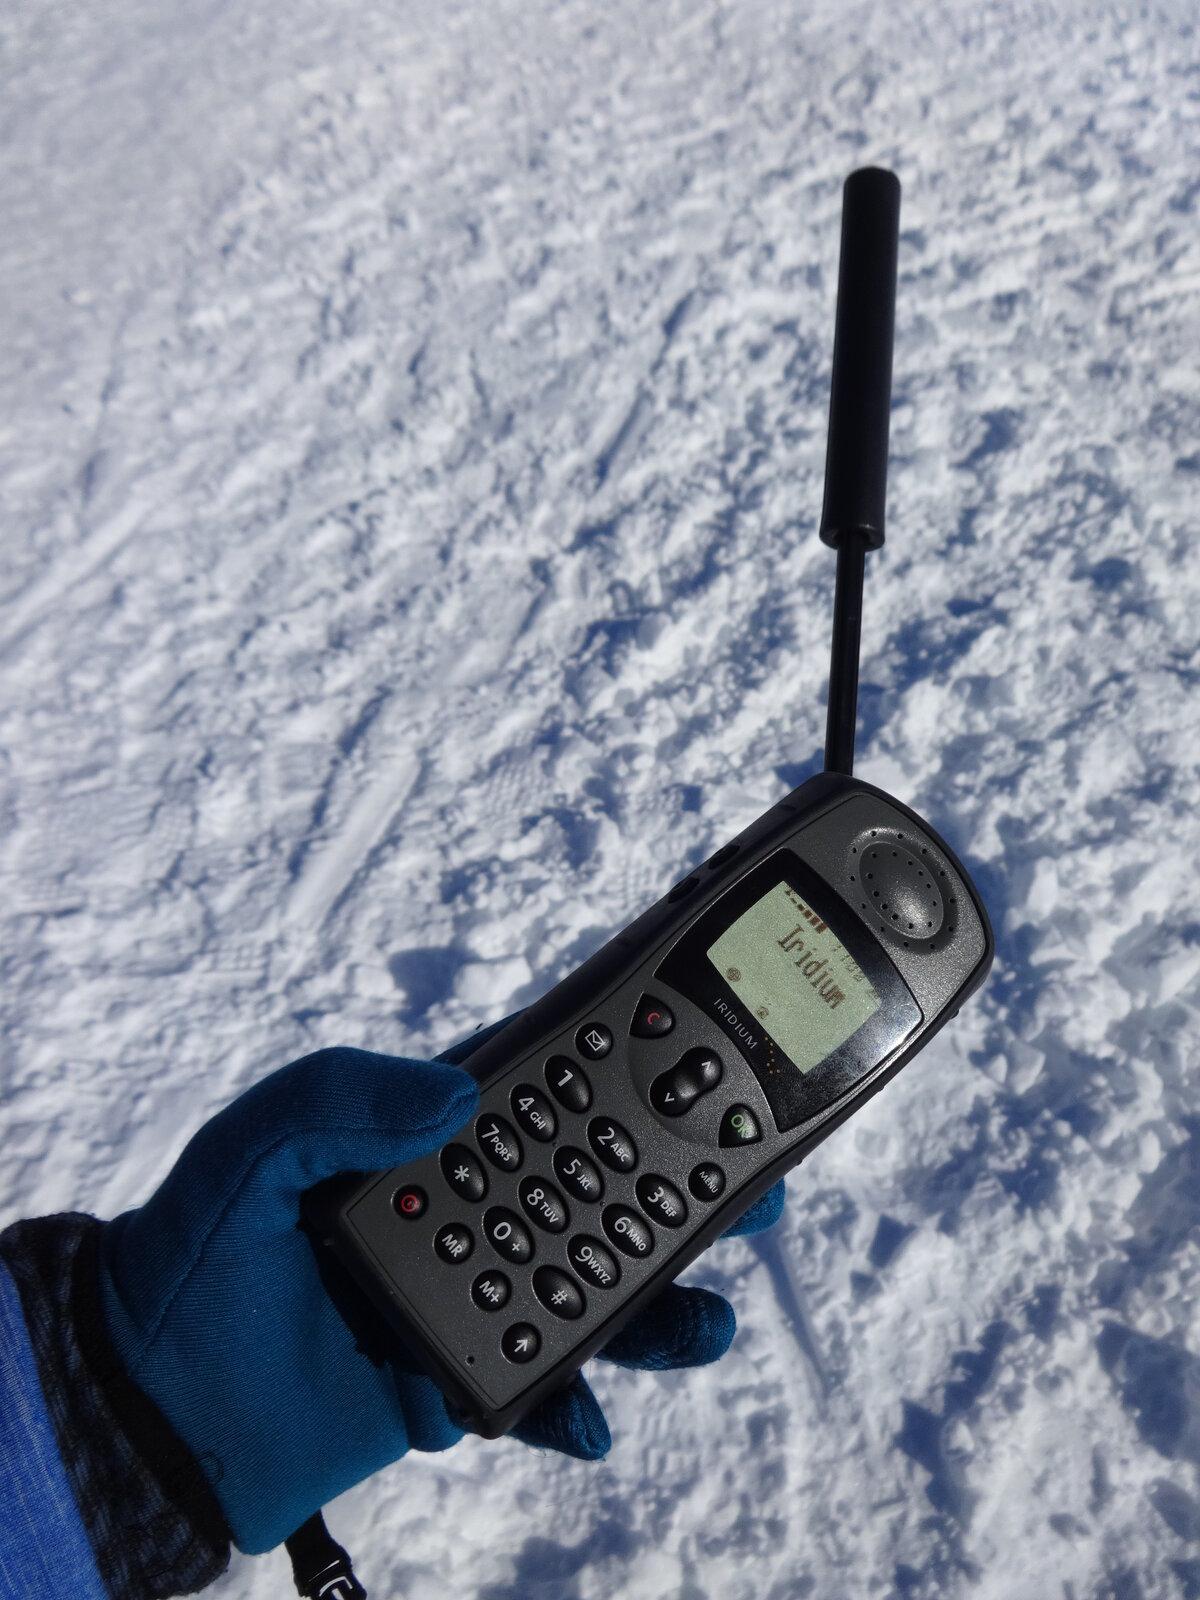 Iridium satellite phone